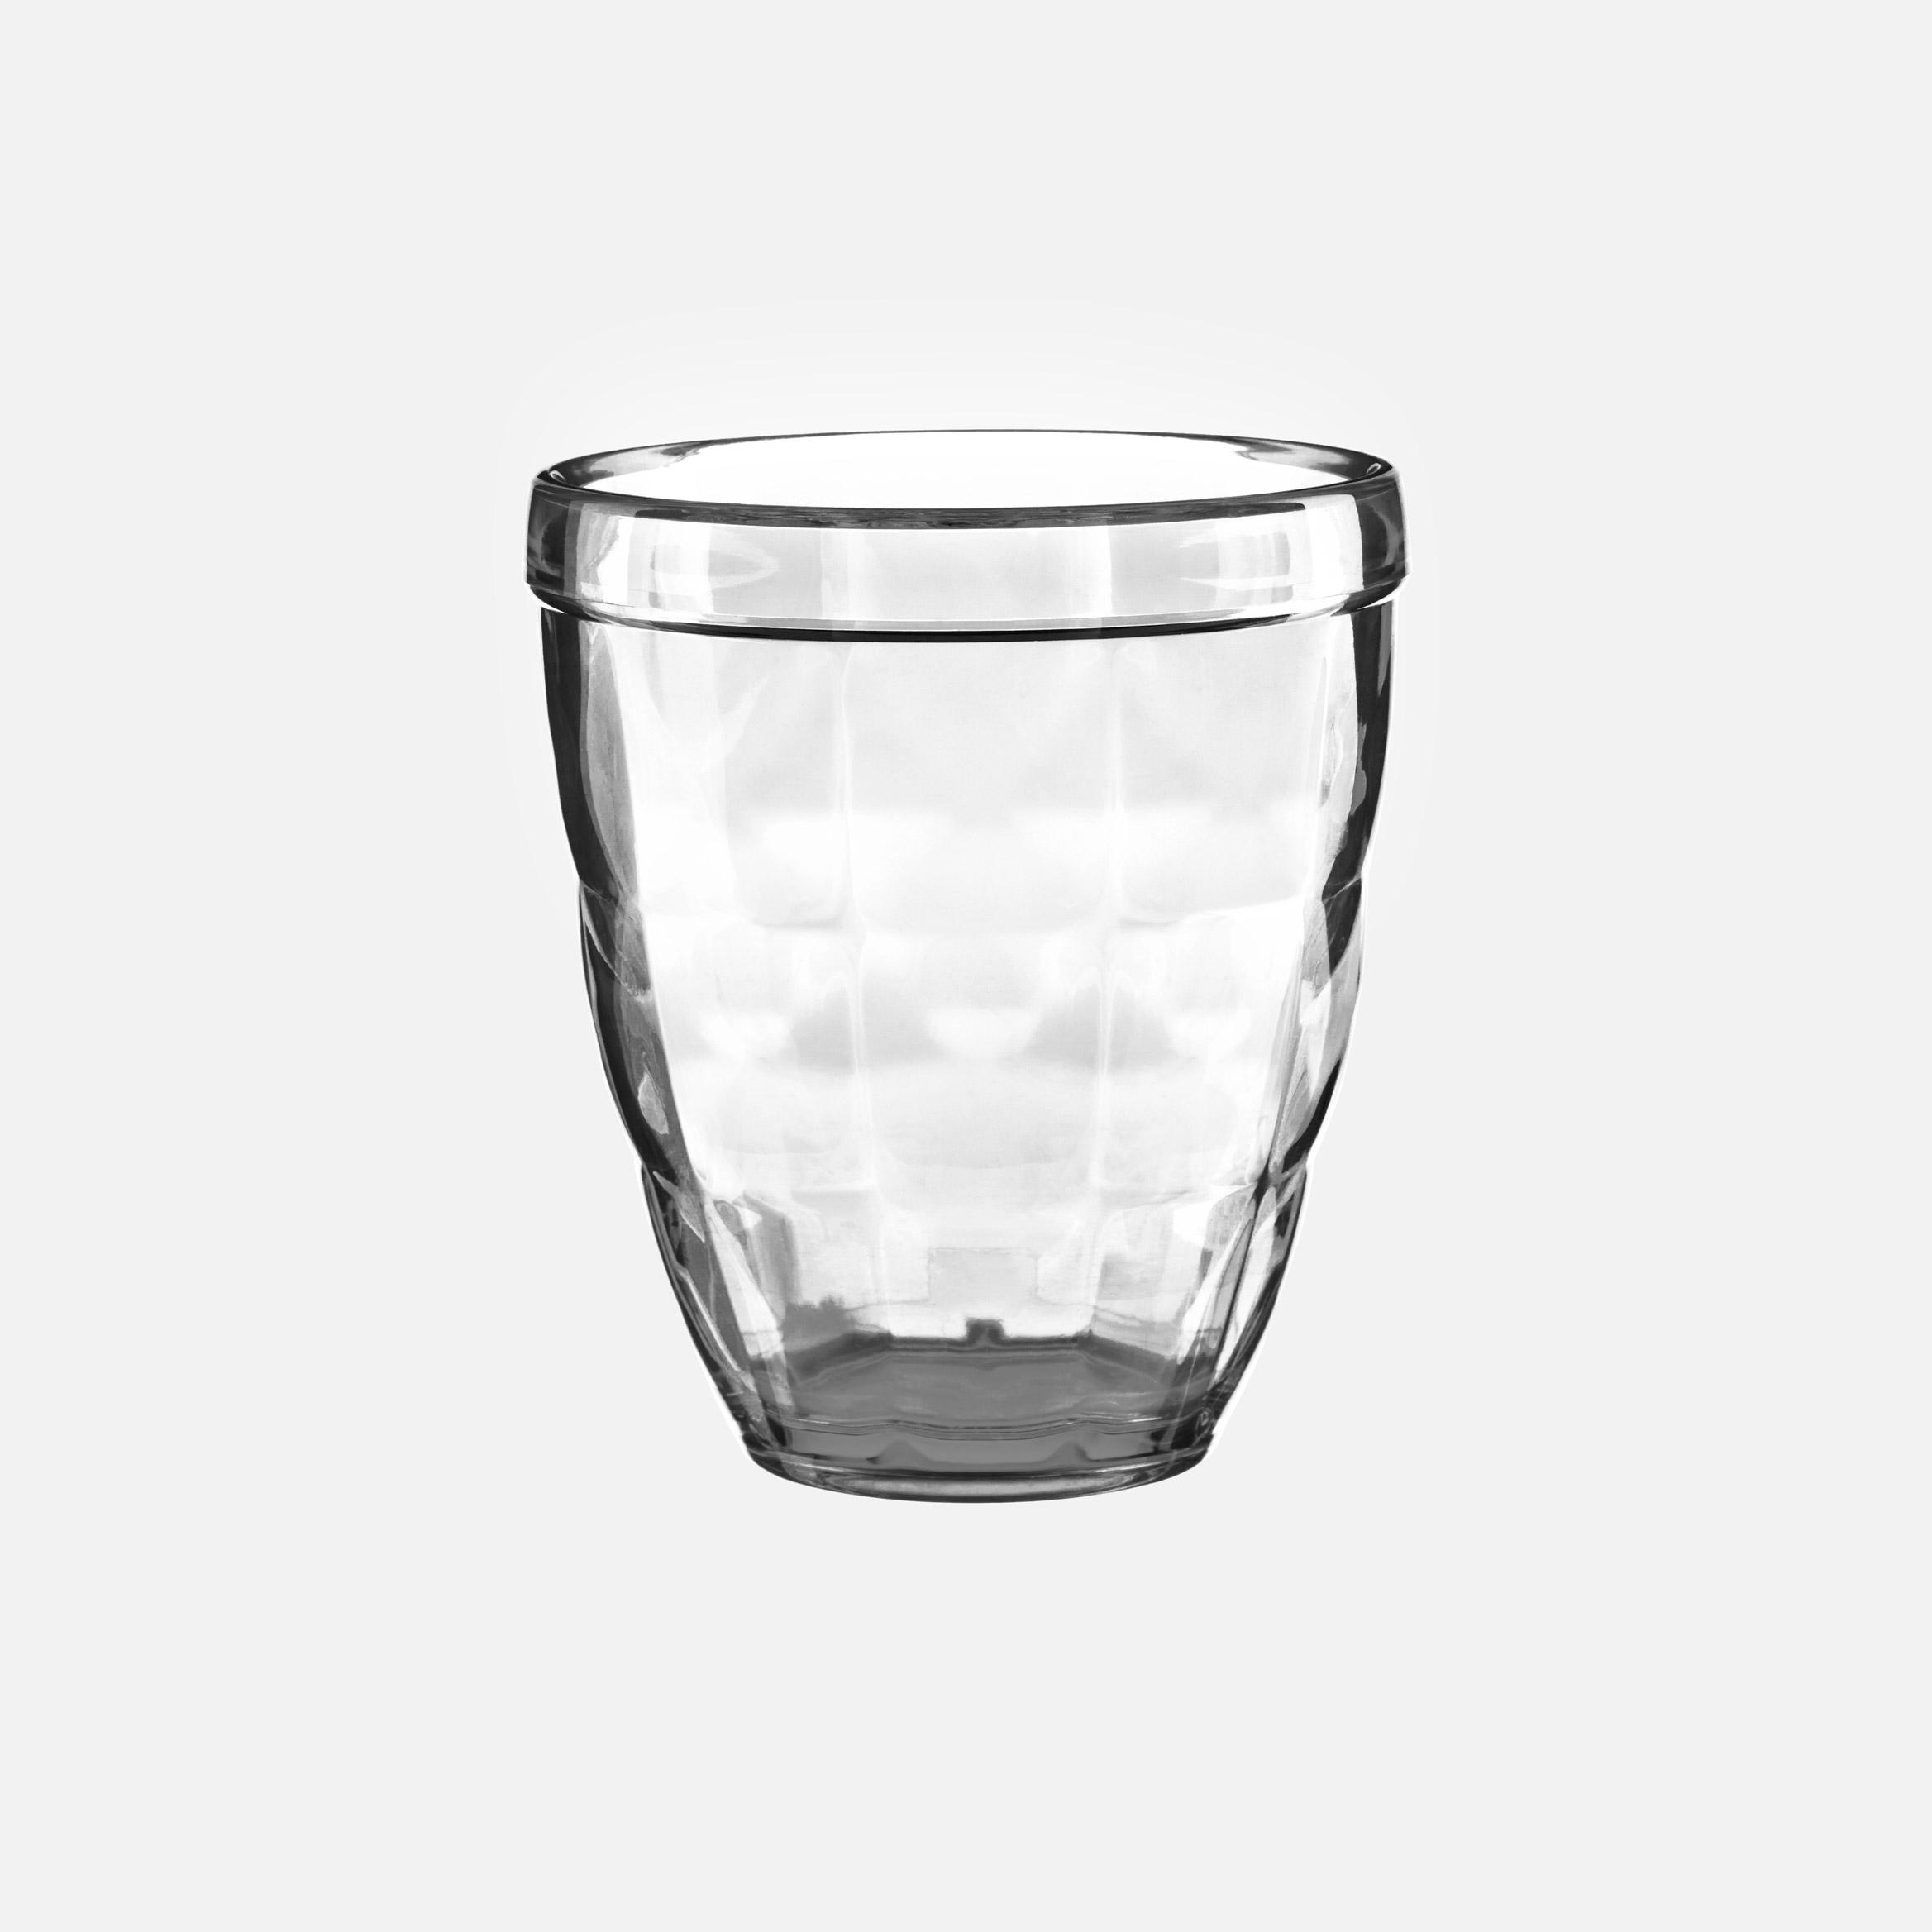 Mafra Cup 300ml